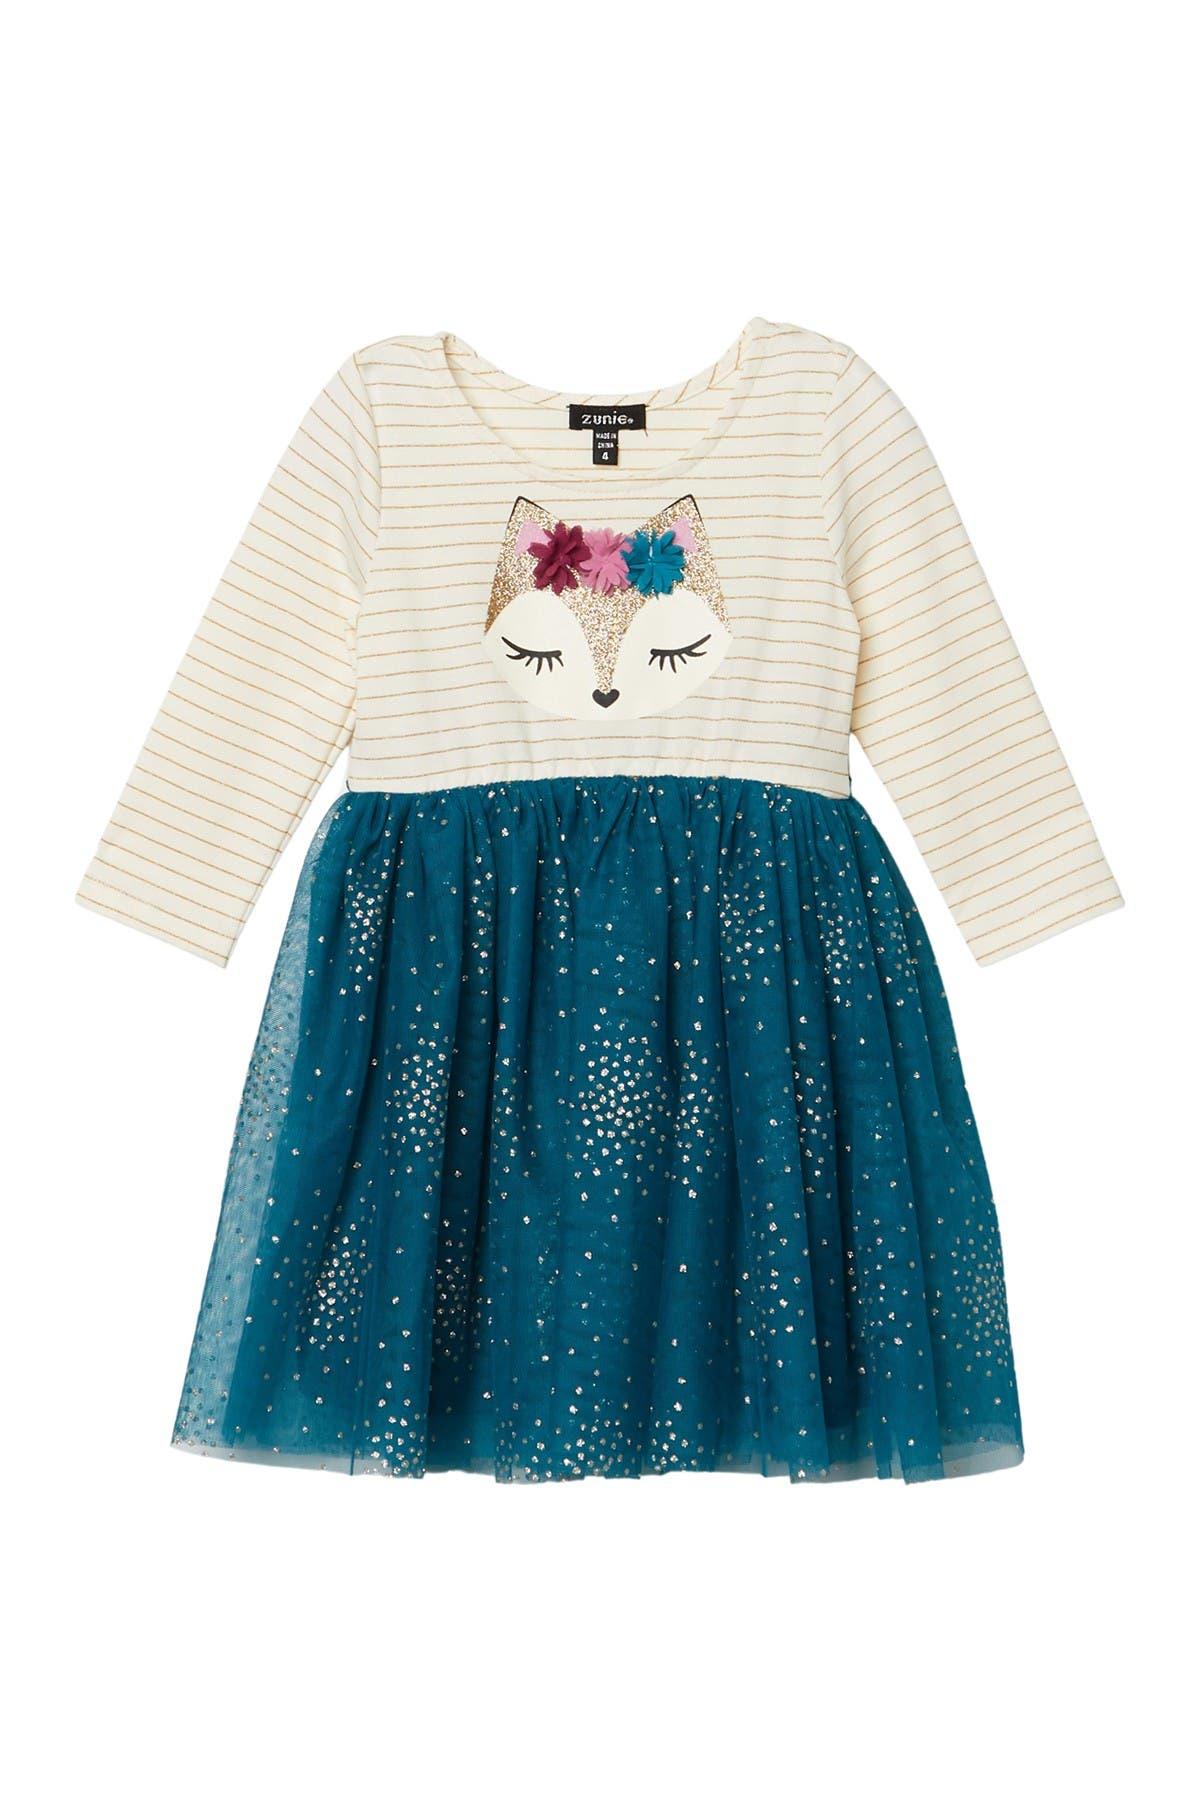 Image of Zunie Stripe Graphic Glitter Dress